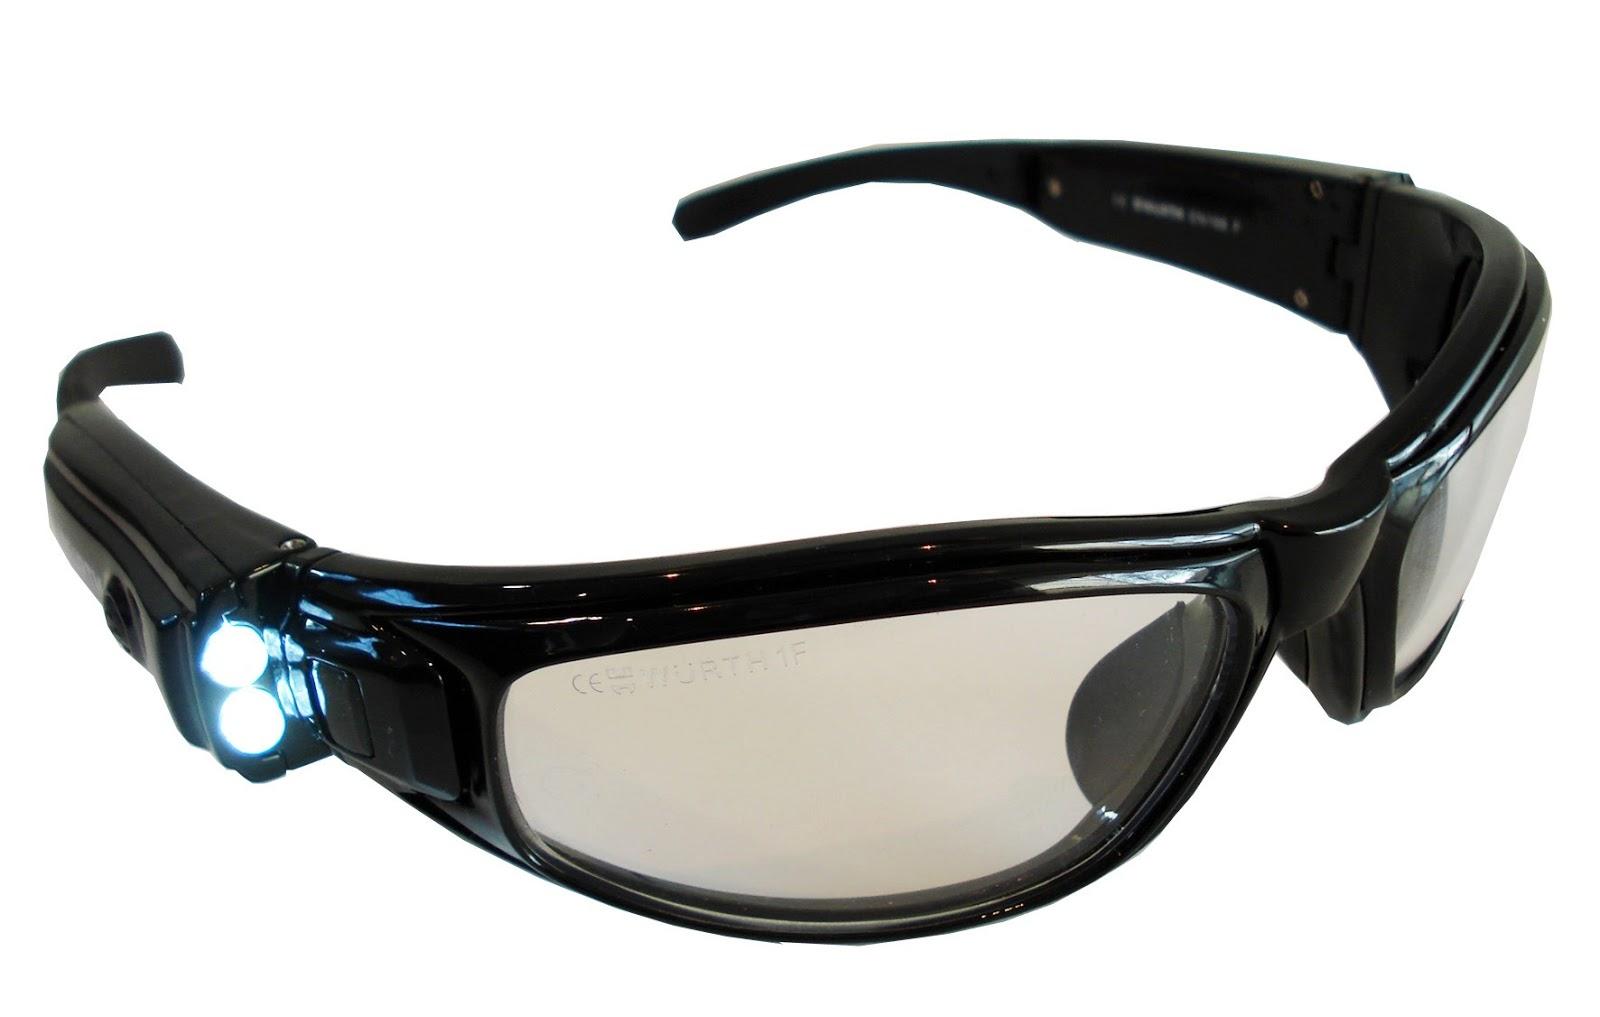 nekora en kayak gafas de protecci n con luz led